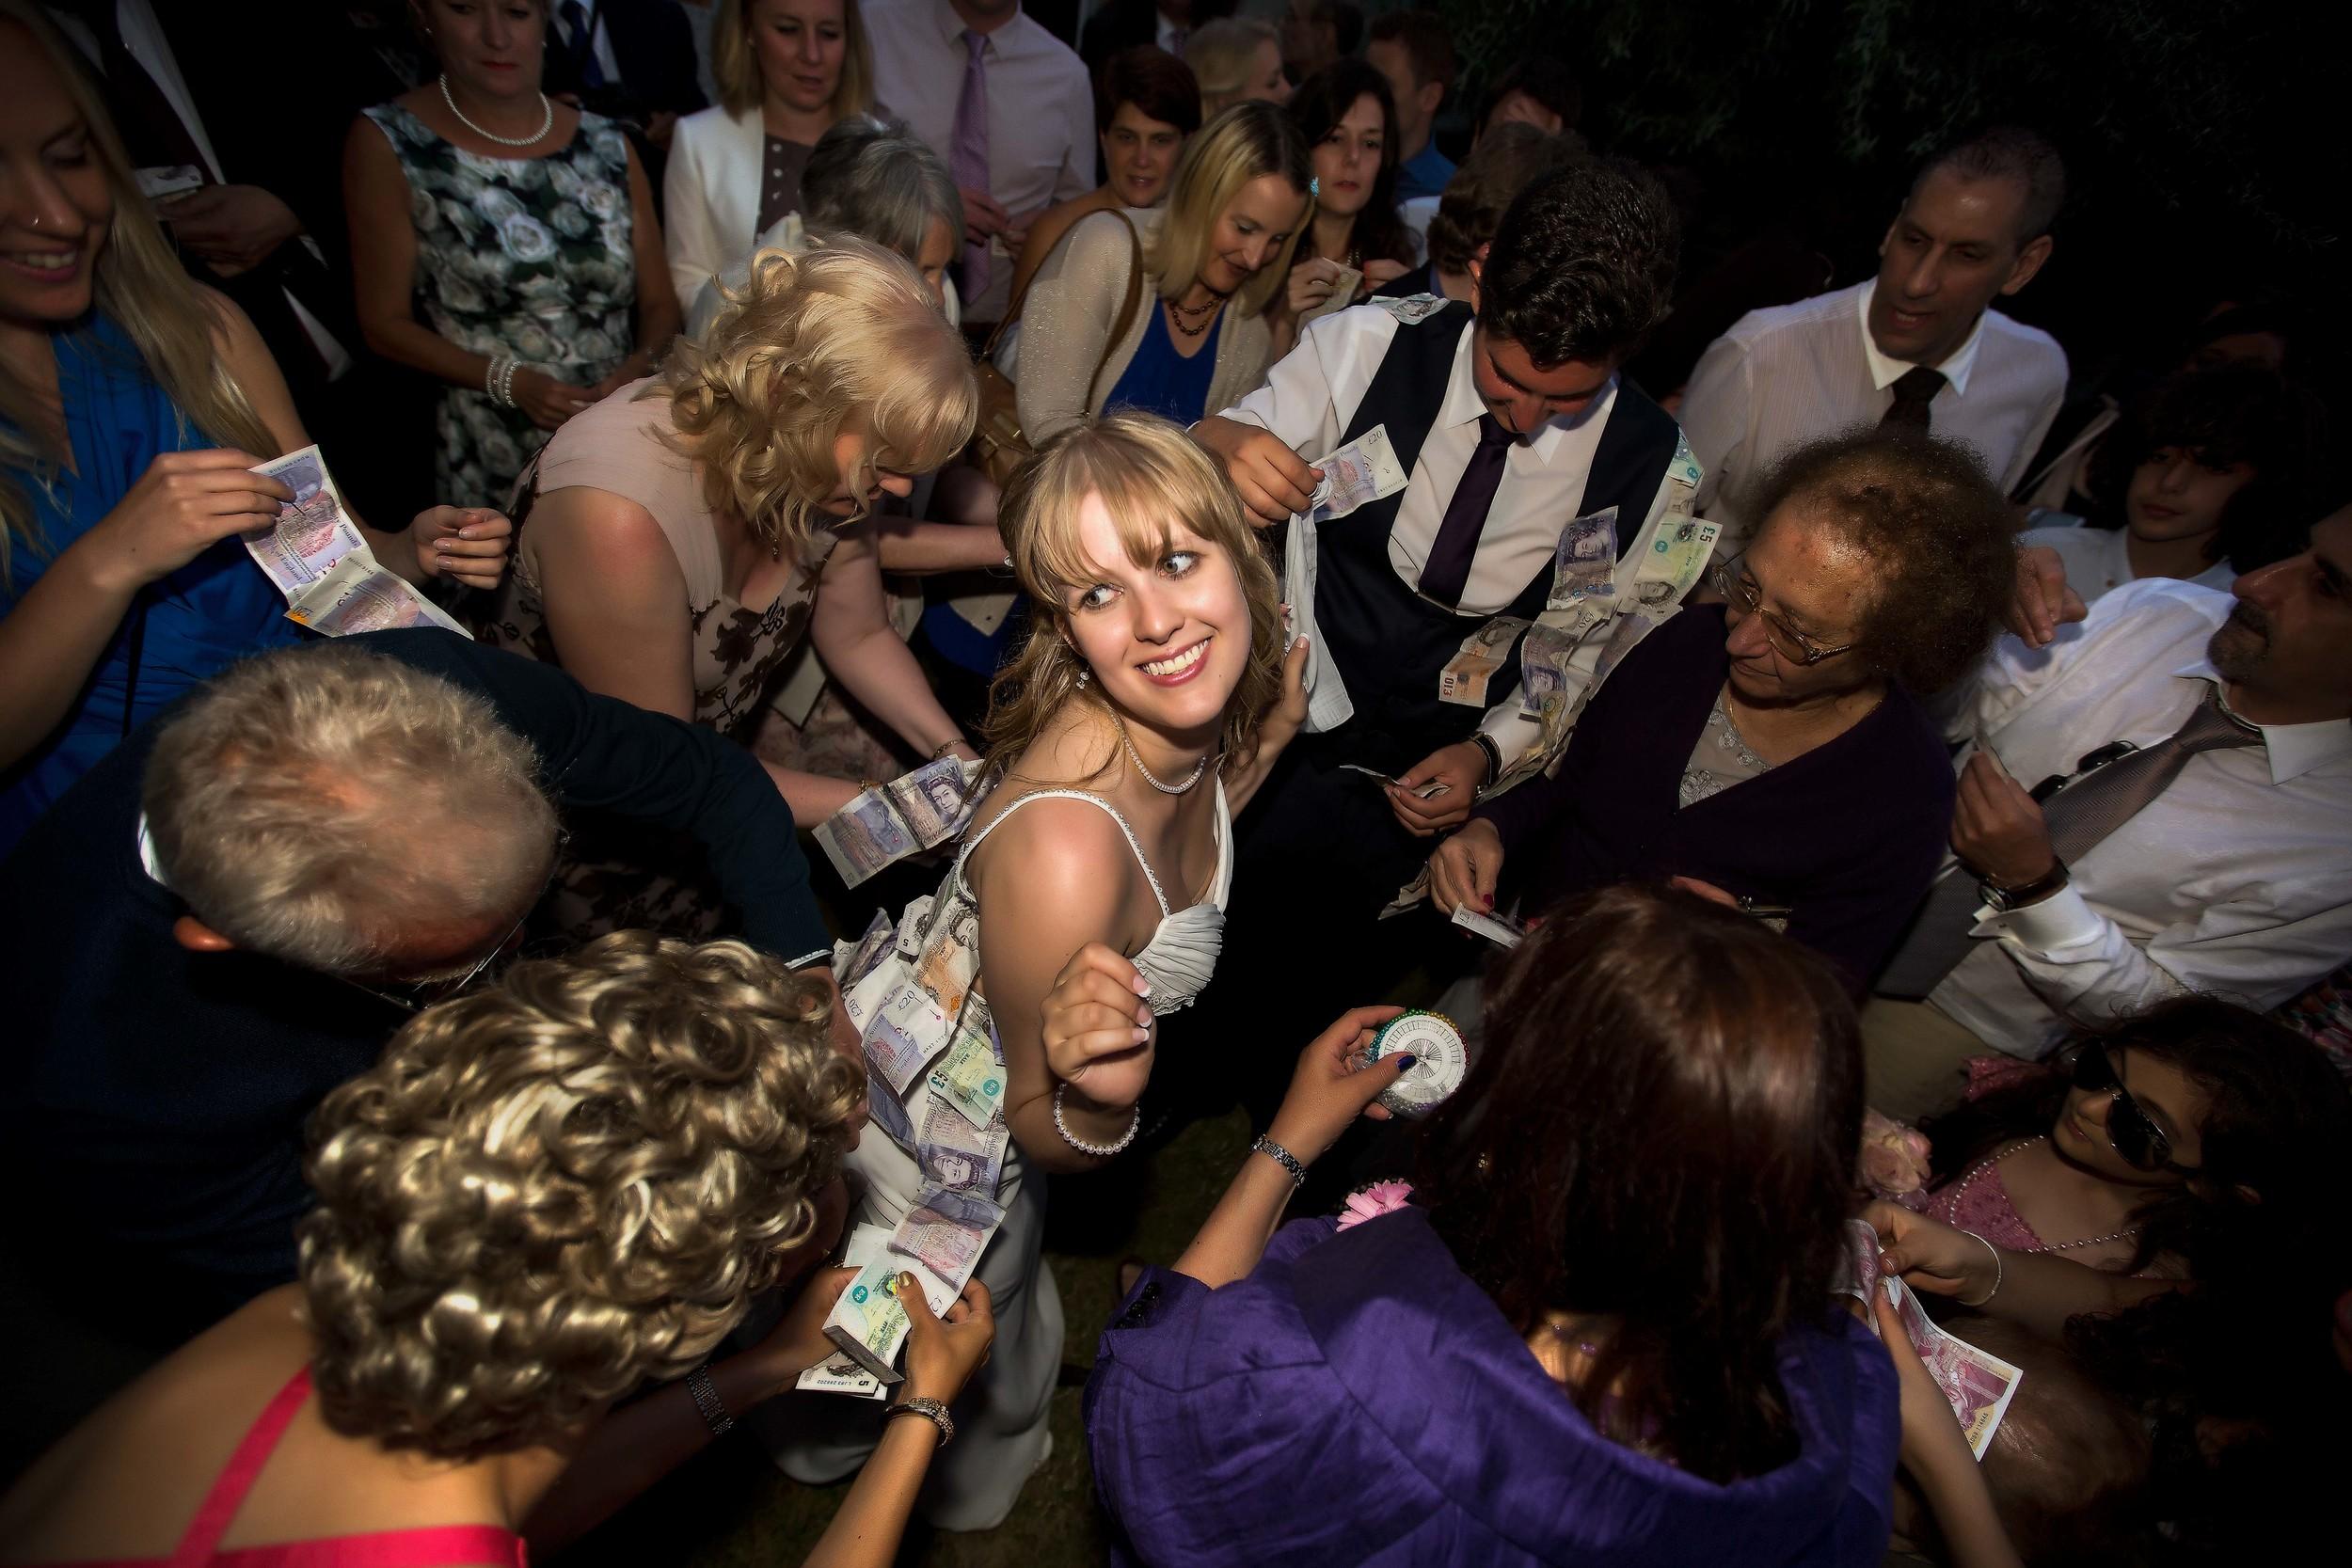 colchester-greek-money-dance-london-uk-destination-wedding-photography-Adam-Rowley